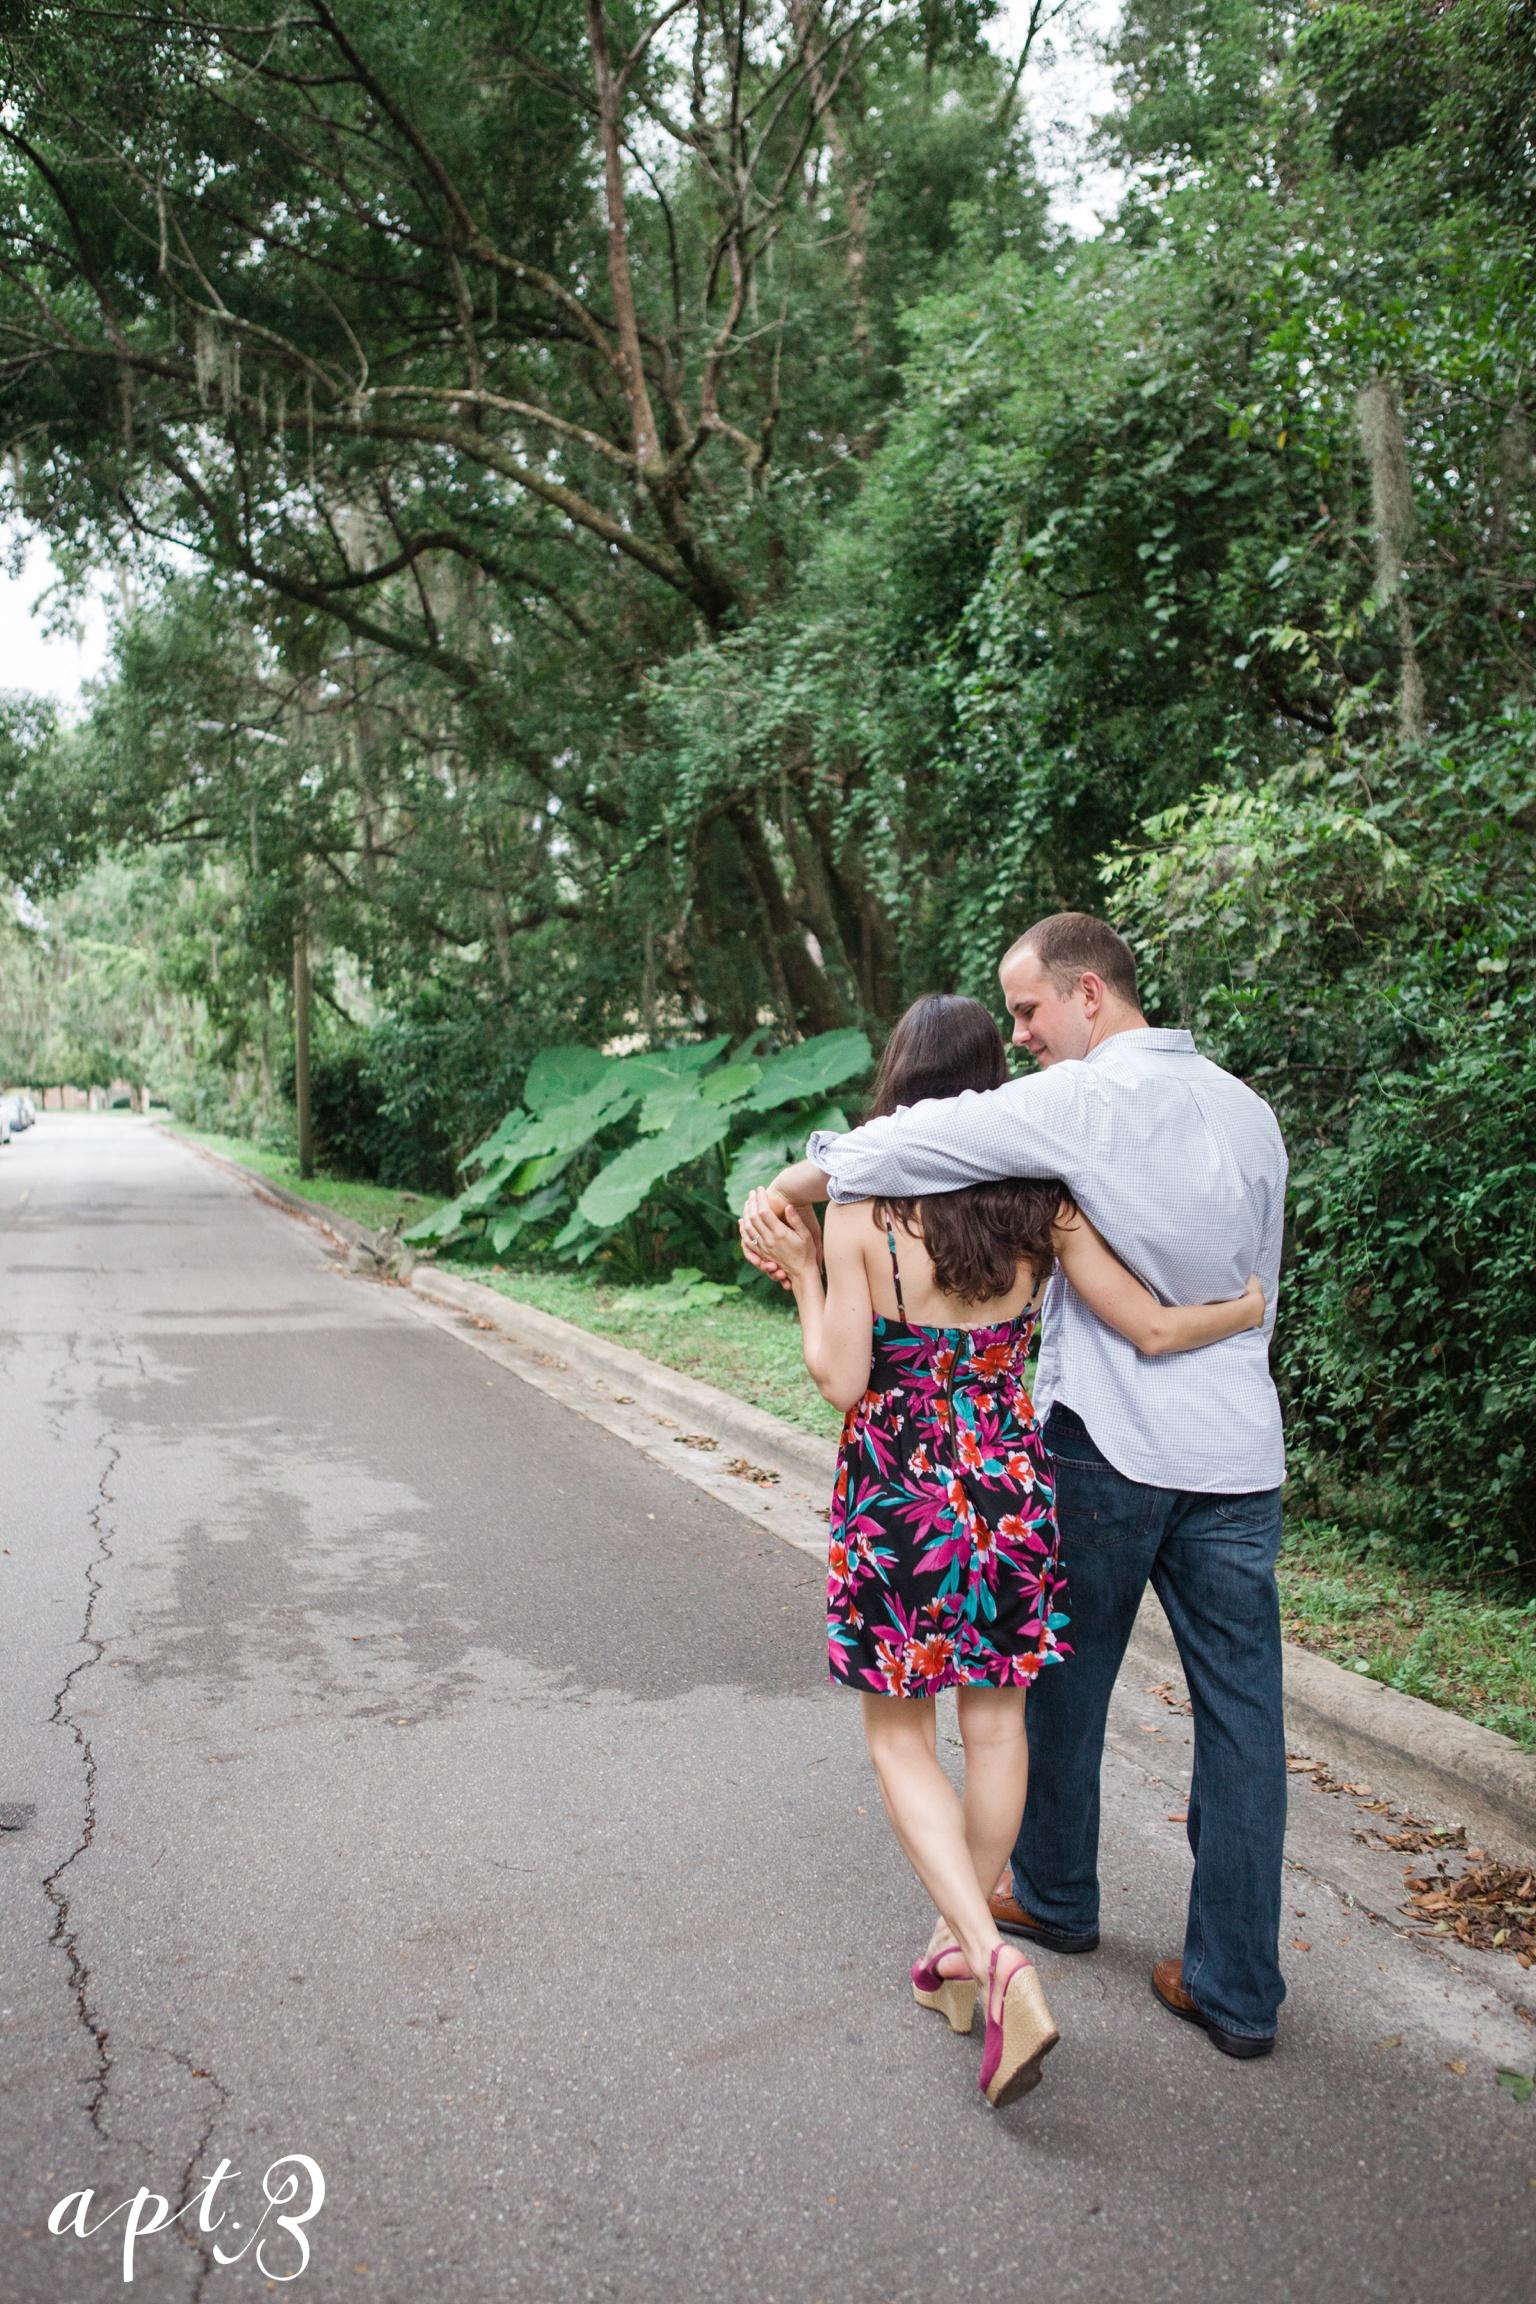 AptBPhotography_GainesvilleEngagement-42.jpg